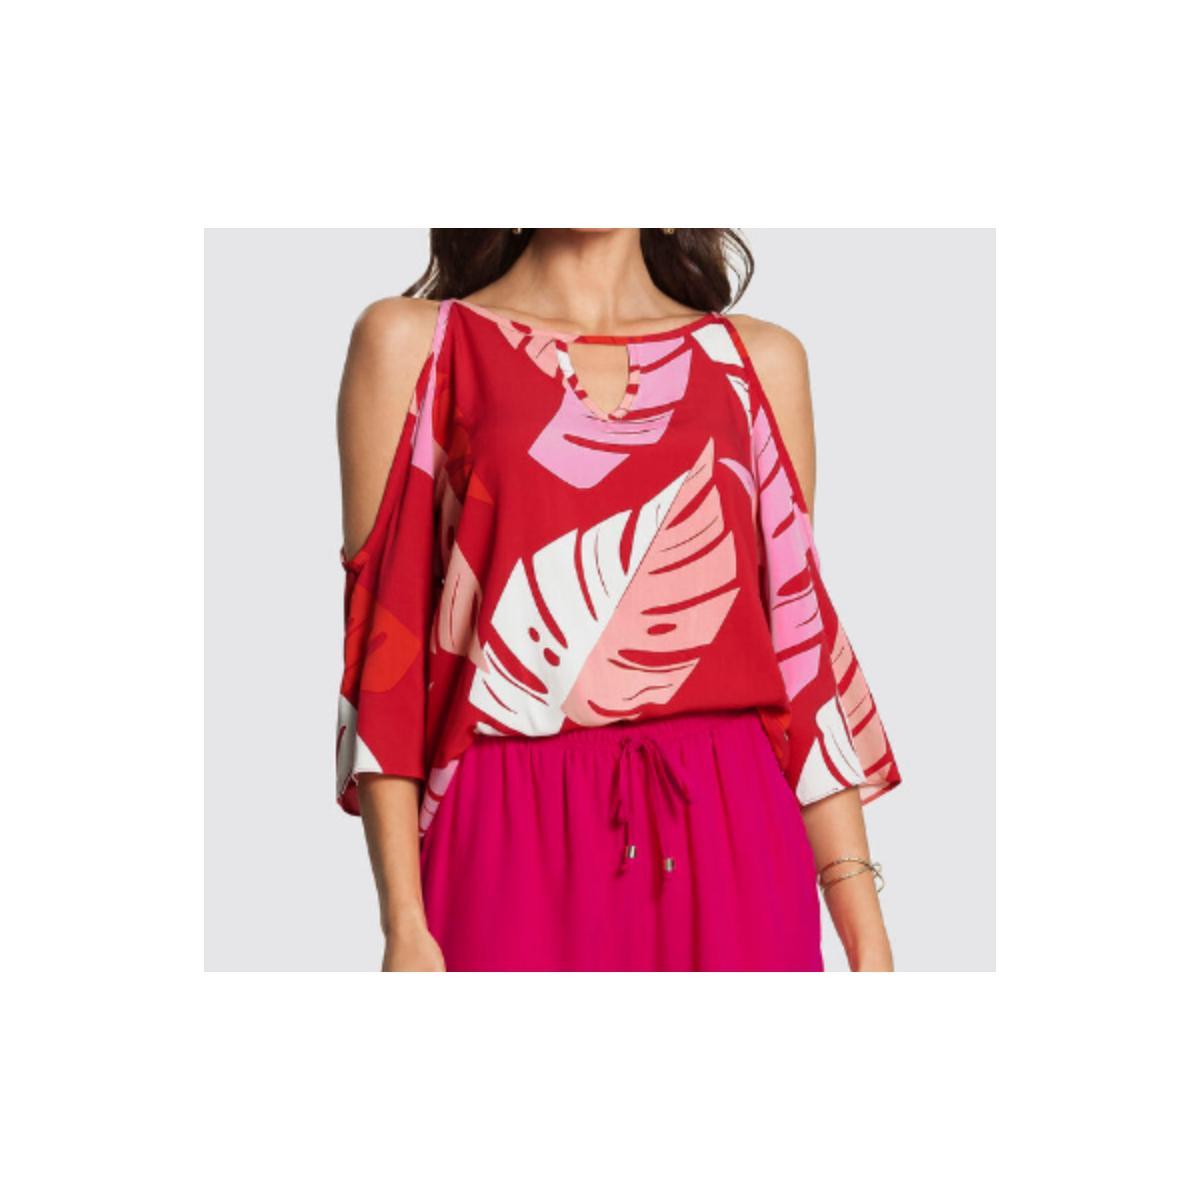 Blusa Feminina Lunender 46554 Vermelho Estampado